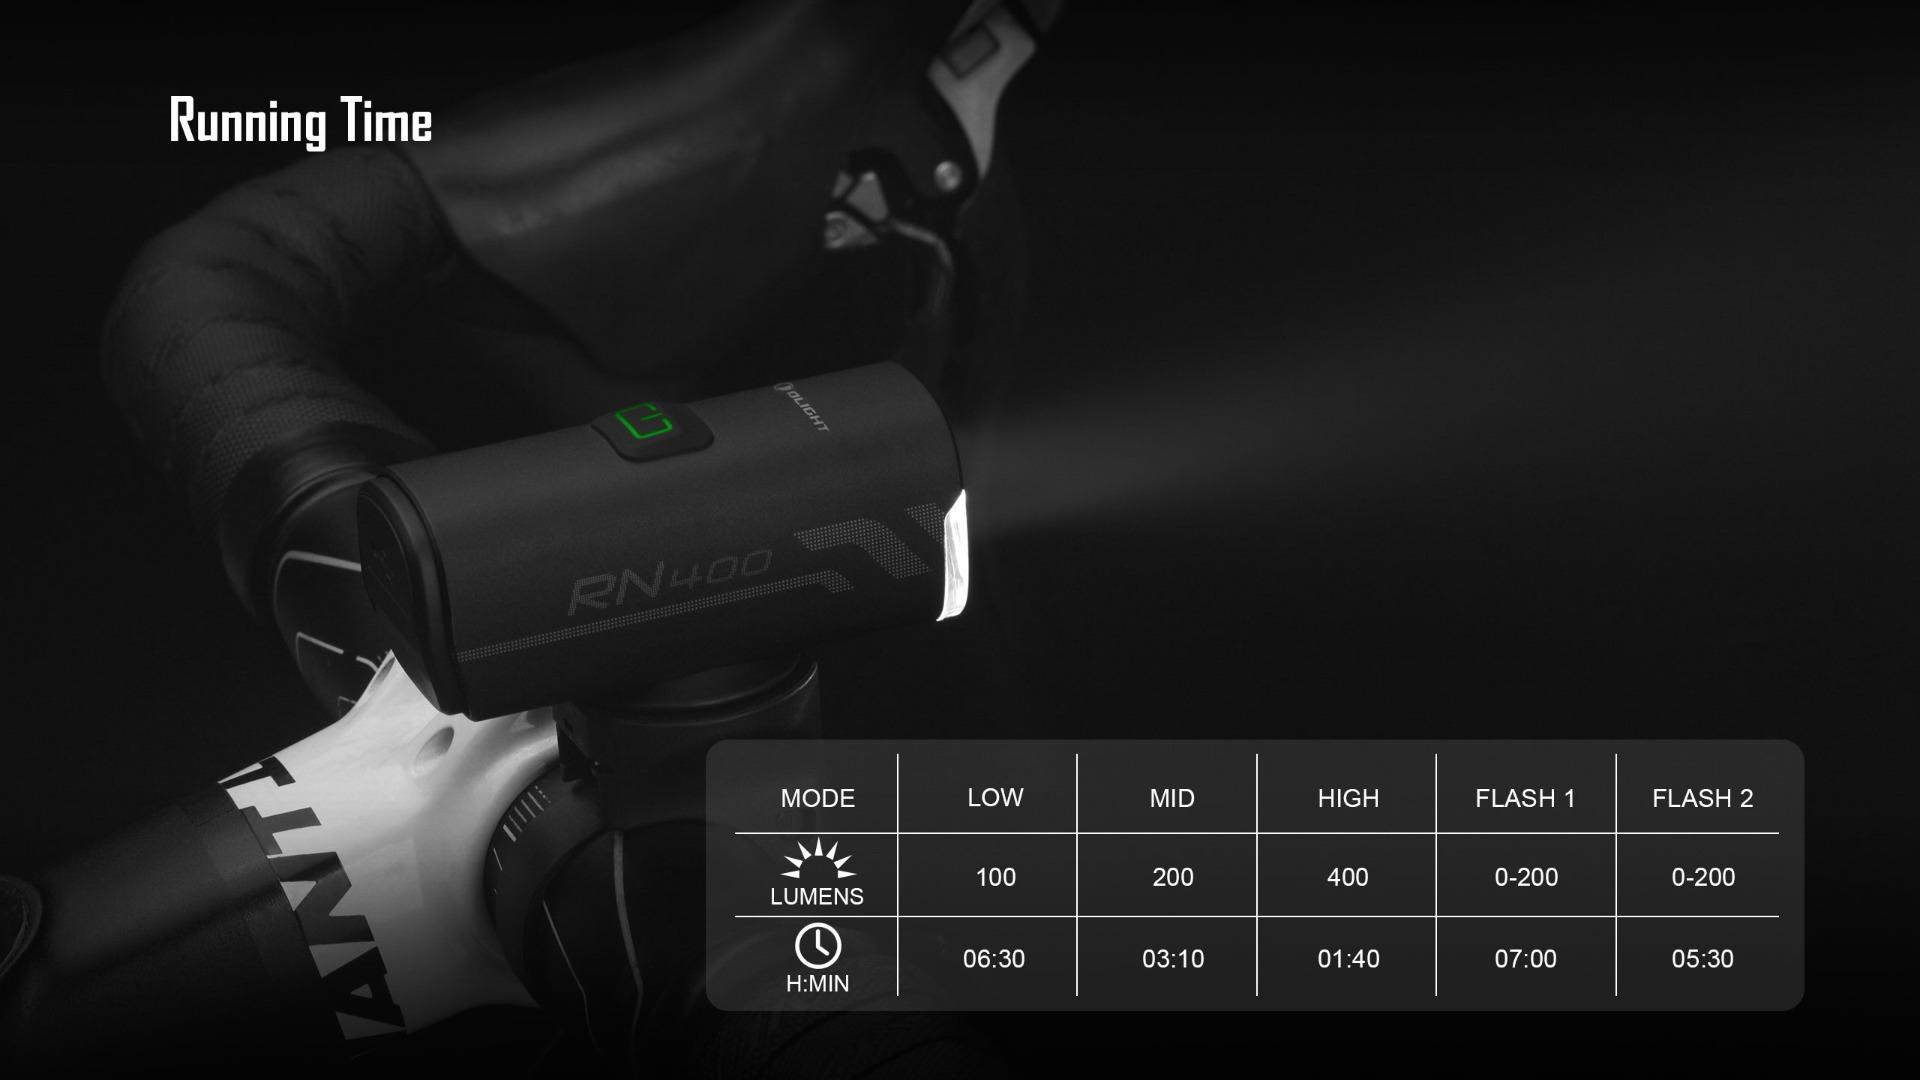 Olight RN 400 Bike LED Light Headlight Runing Time